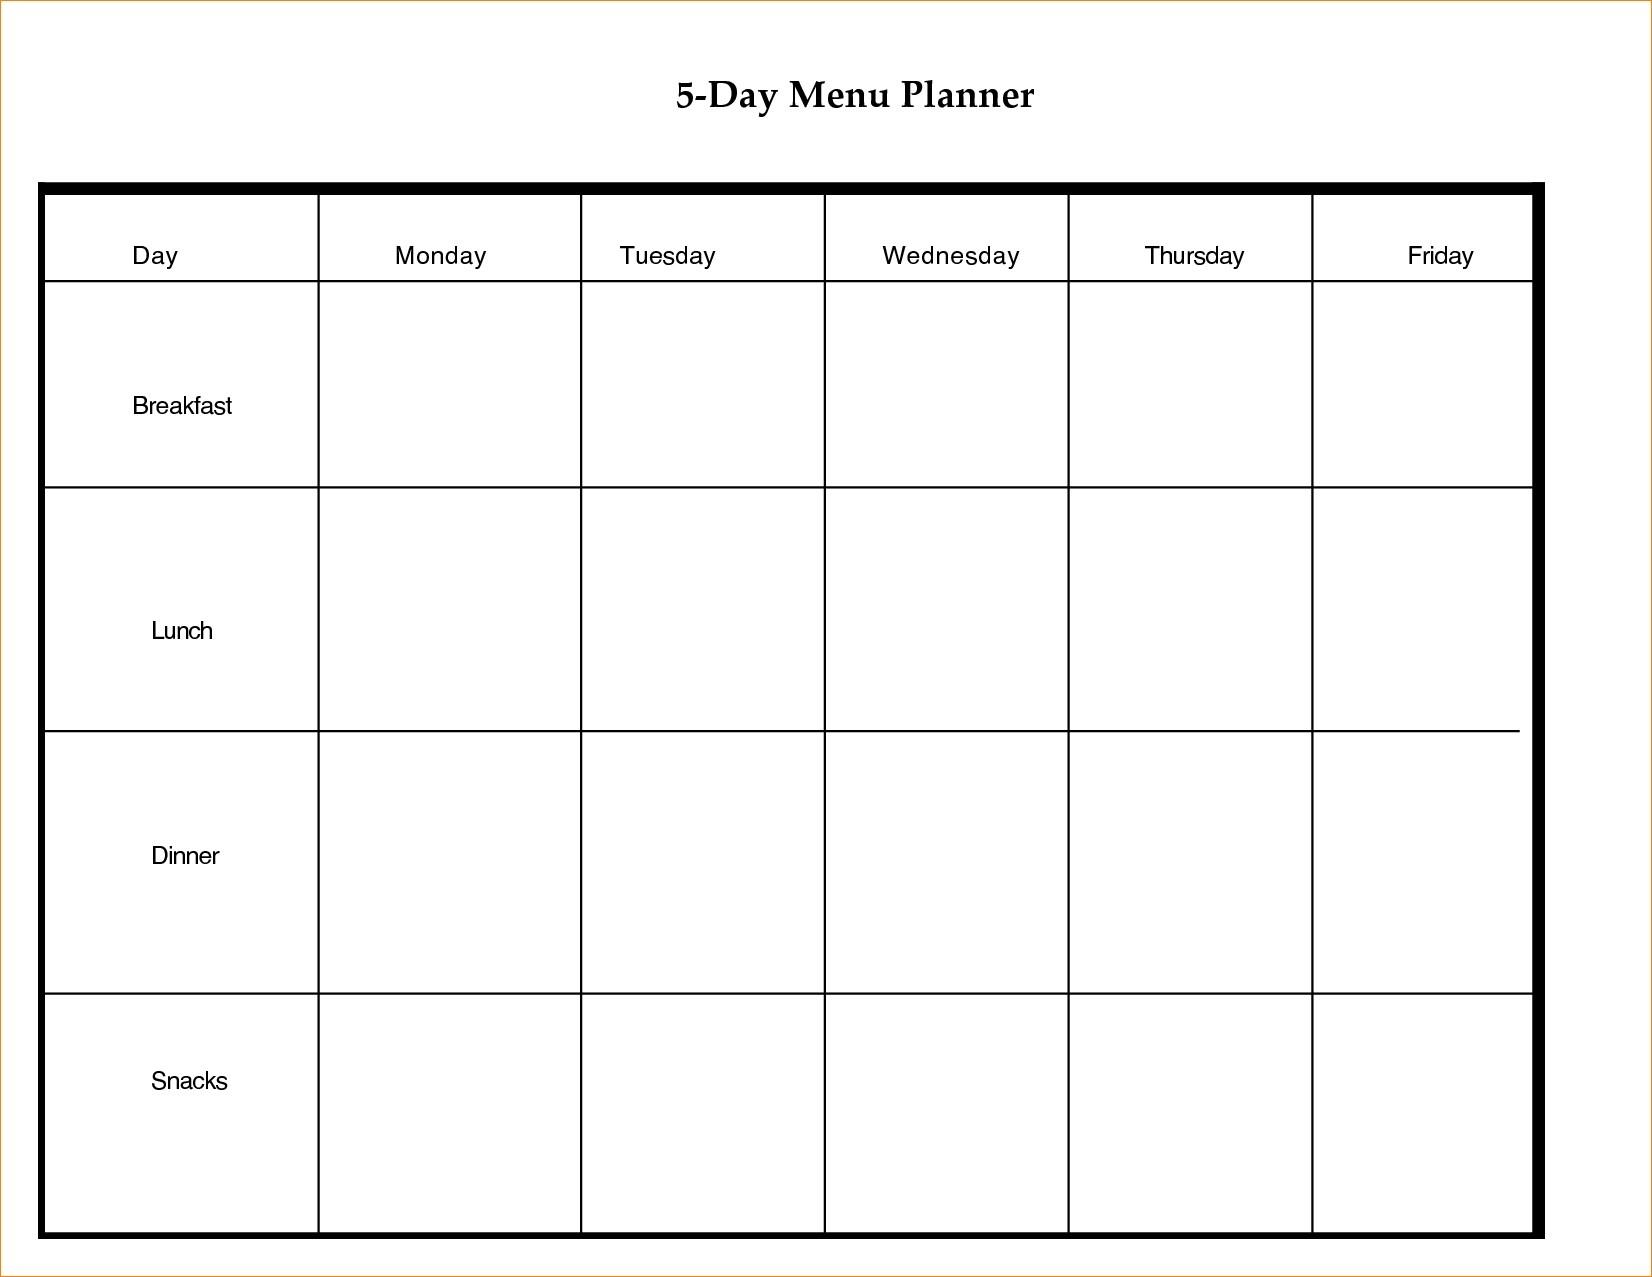 Printable 5 Day Calendar Blank Calendar Template 5 Day Week 0 8 With for Blank Calendar For This Week